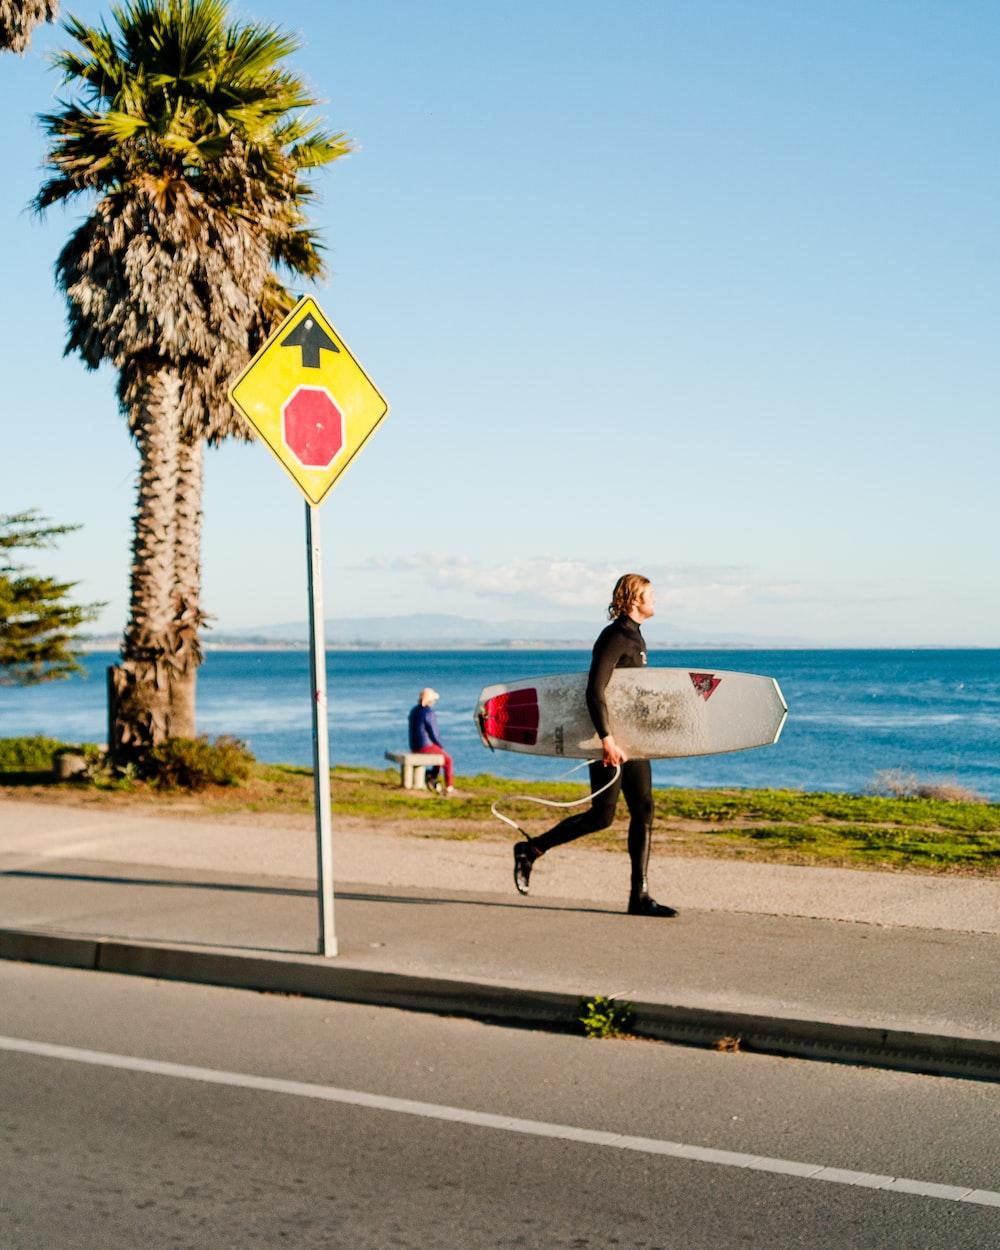 man holding surfboard near beach